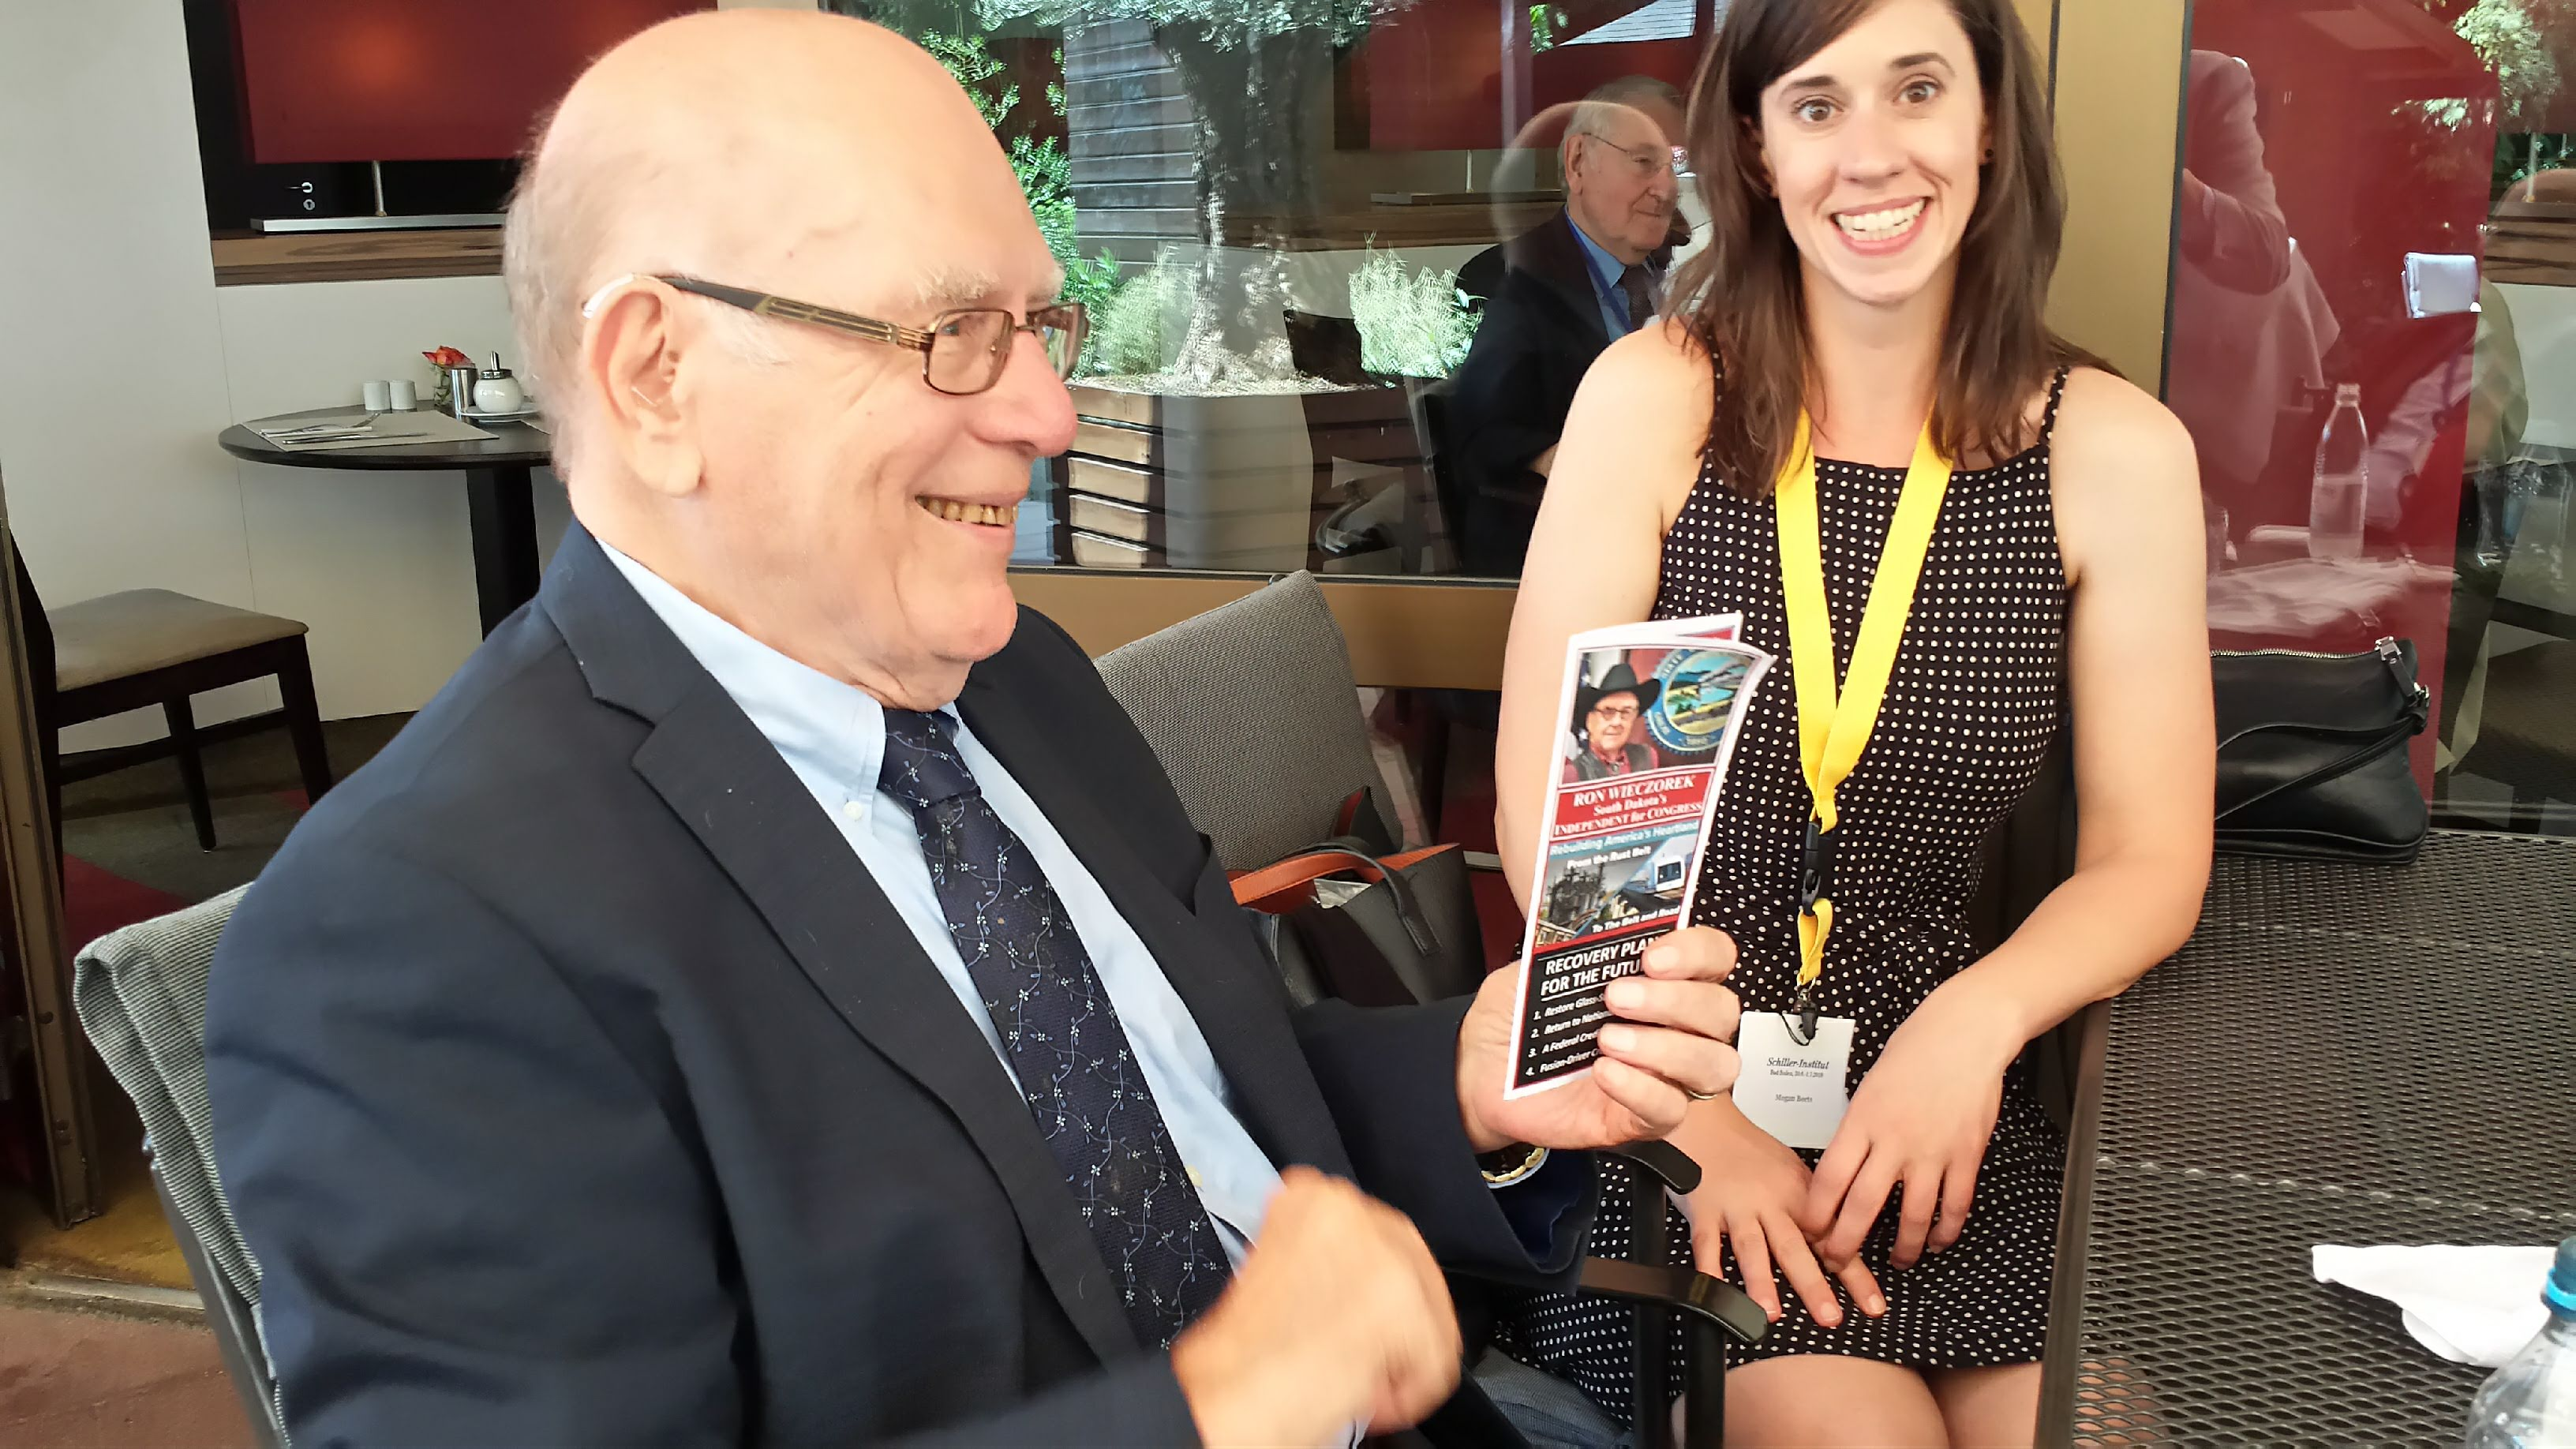 Wieczorek Campaign Literature Put Smile on LaRouche